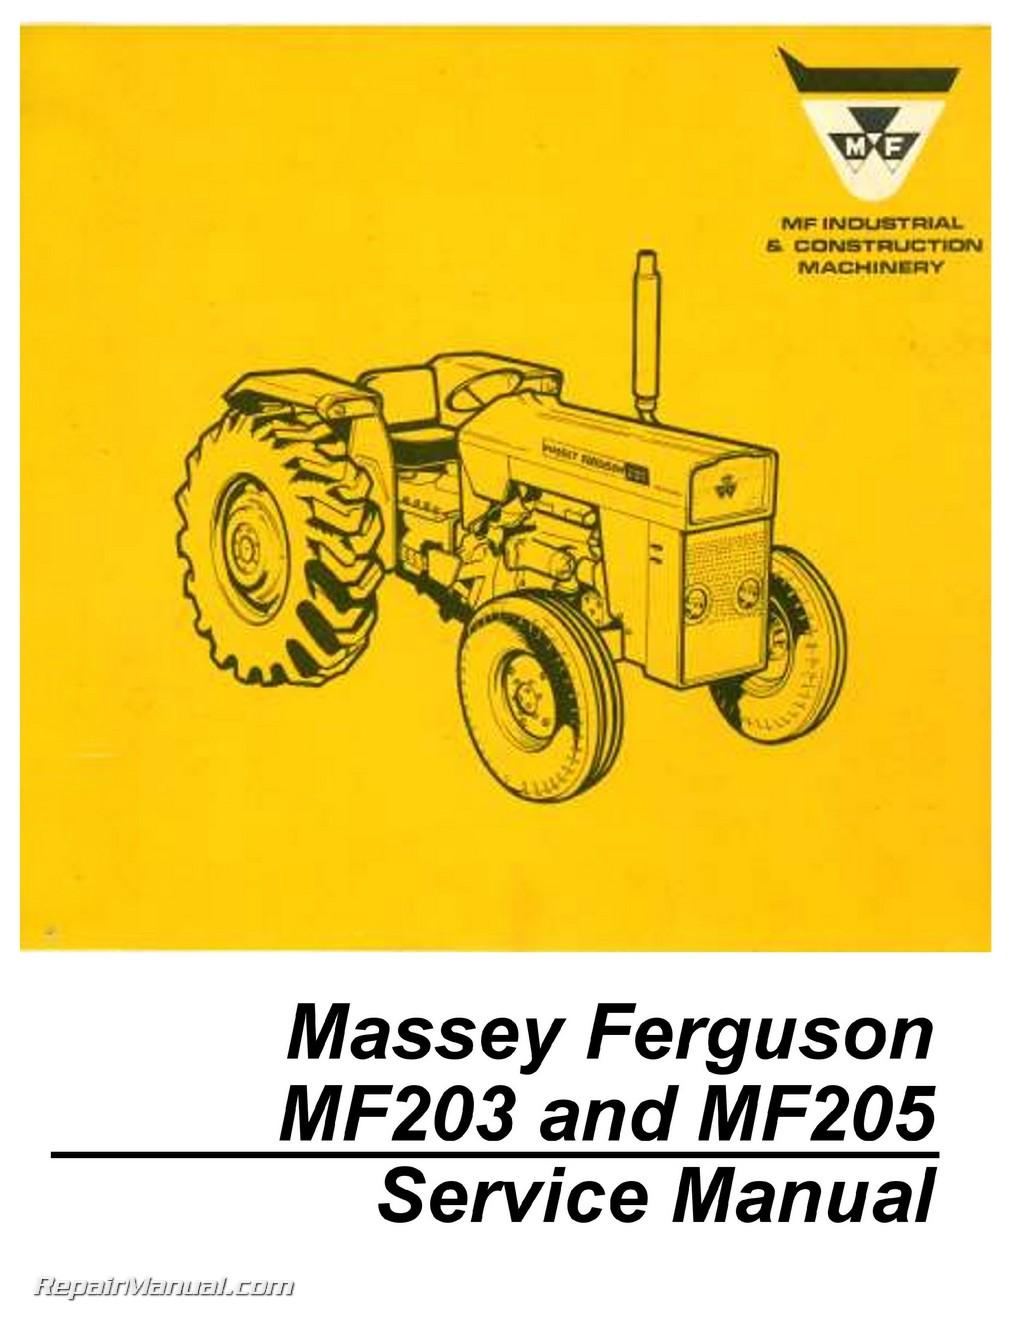 Massey-Ferguson-MF203-MF205-Service-Manual_Page_1.jpg ...